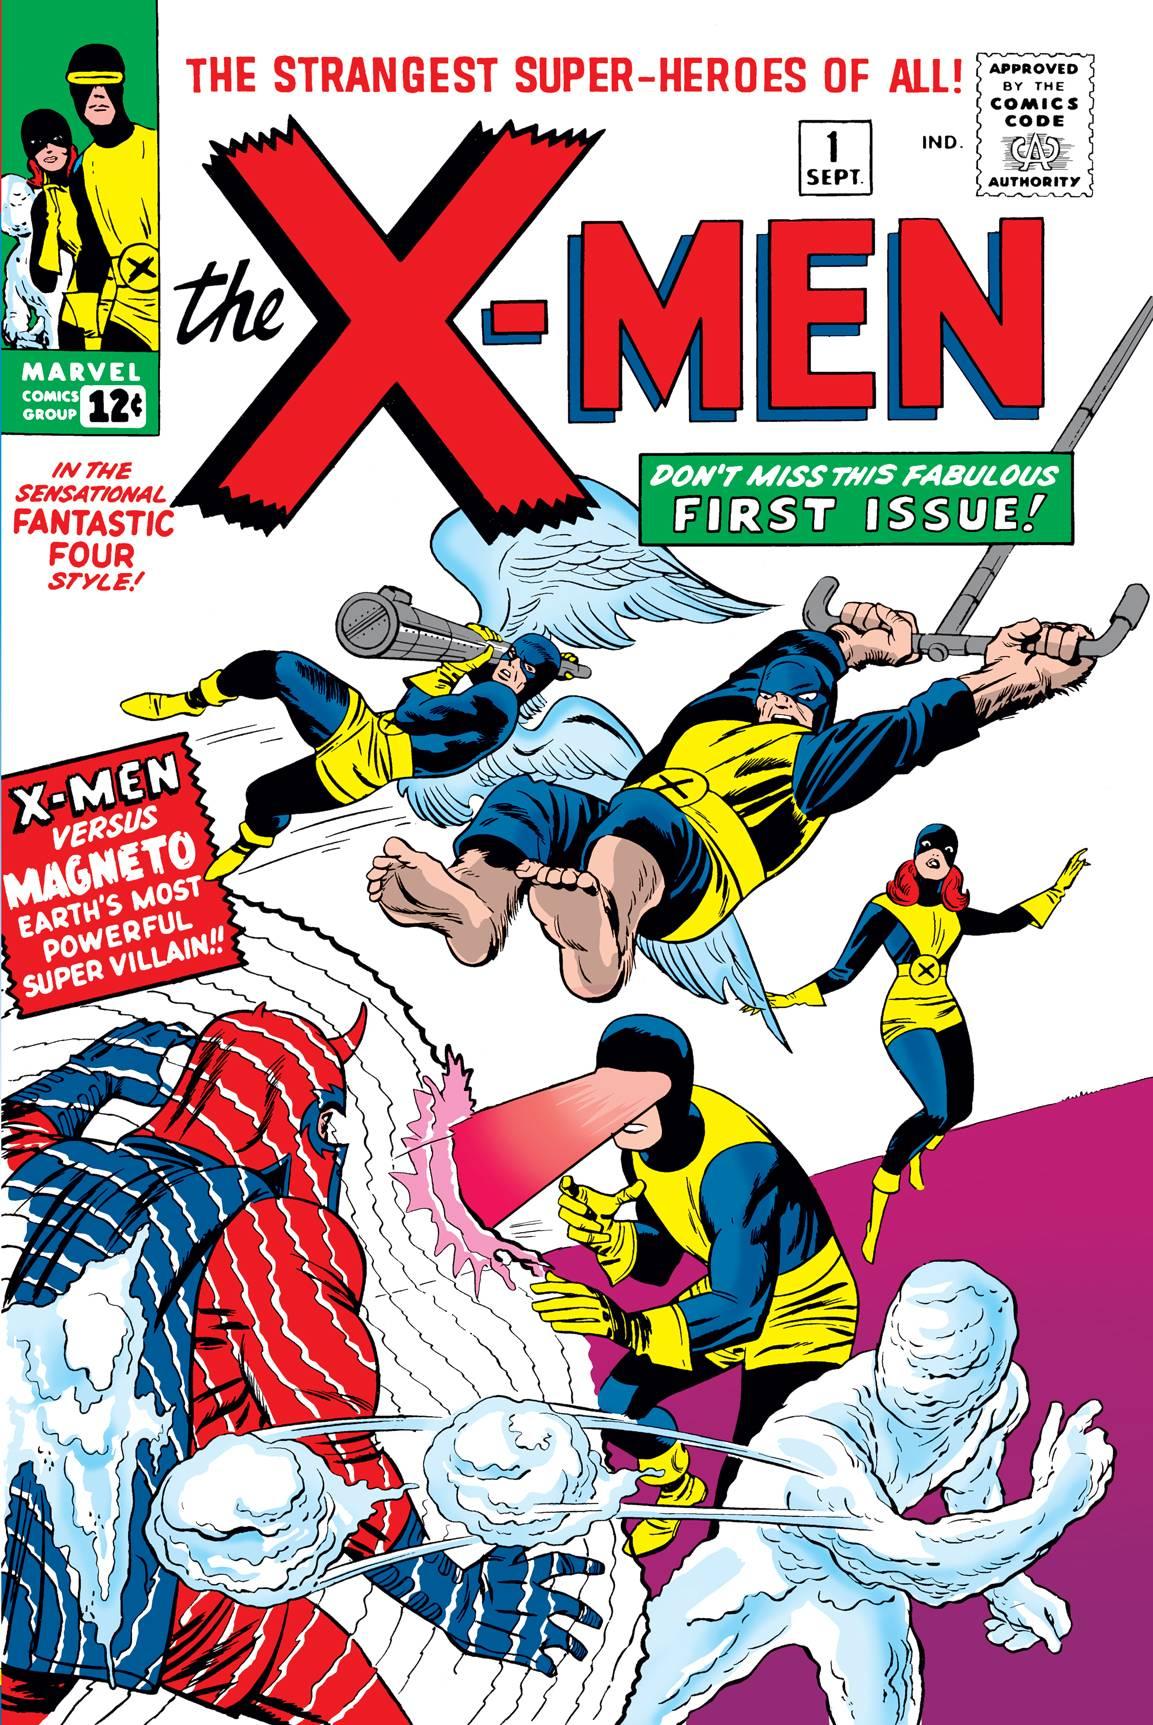 MIGHTY MMW X-MEN STRANGEST SUPER HEROES GN TP VOL 01 DM VAR